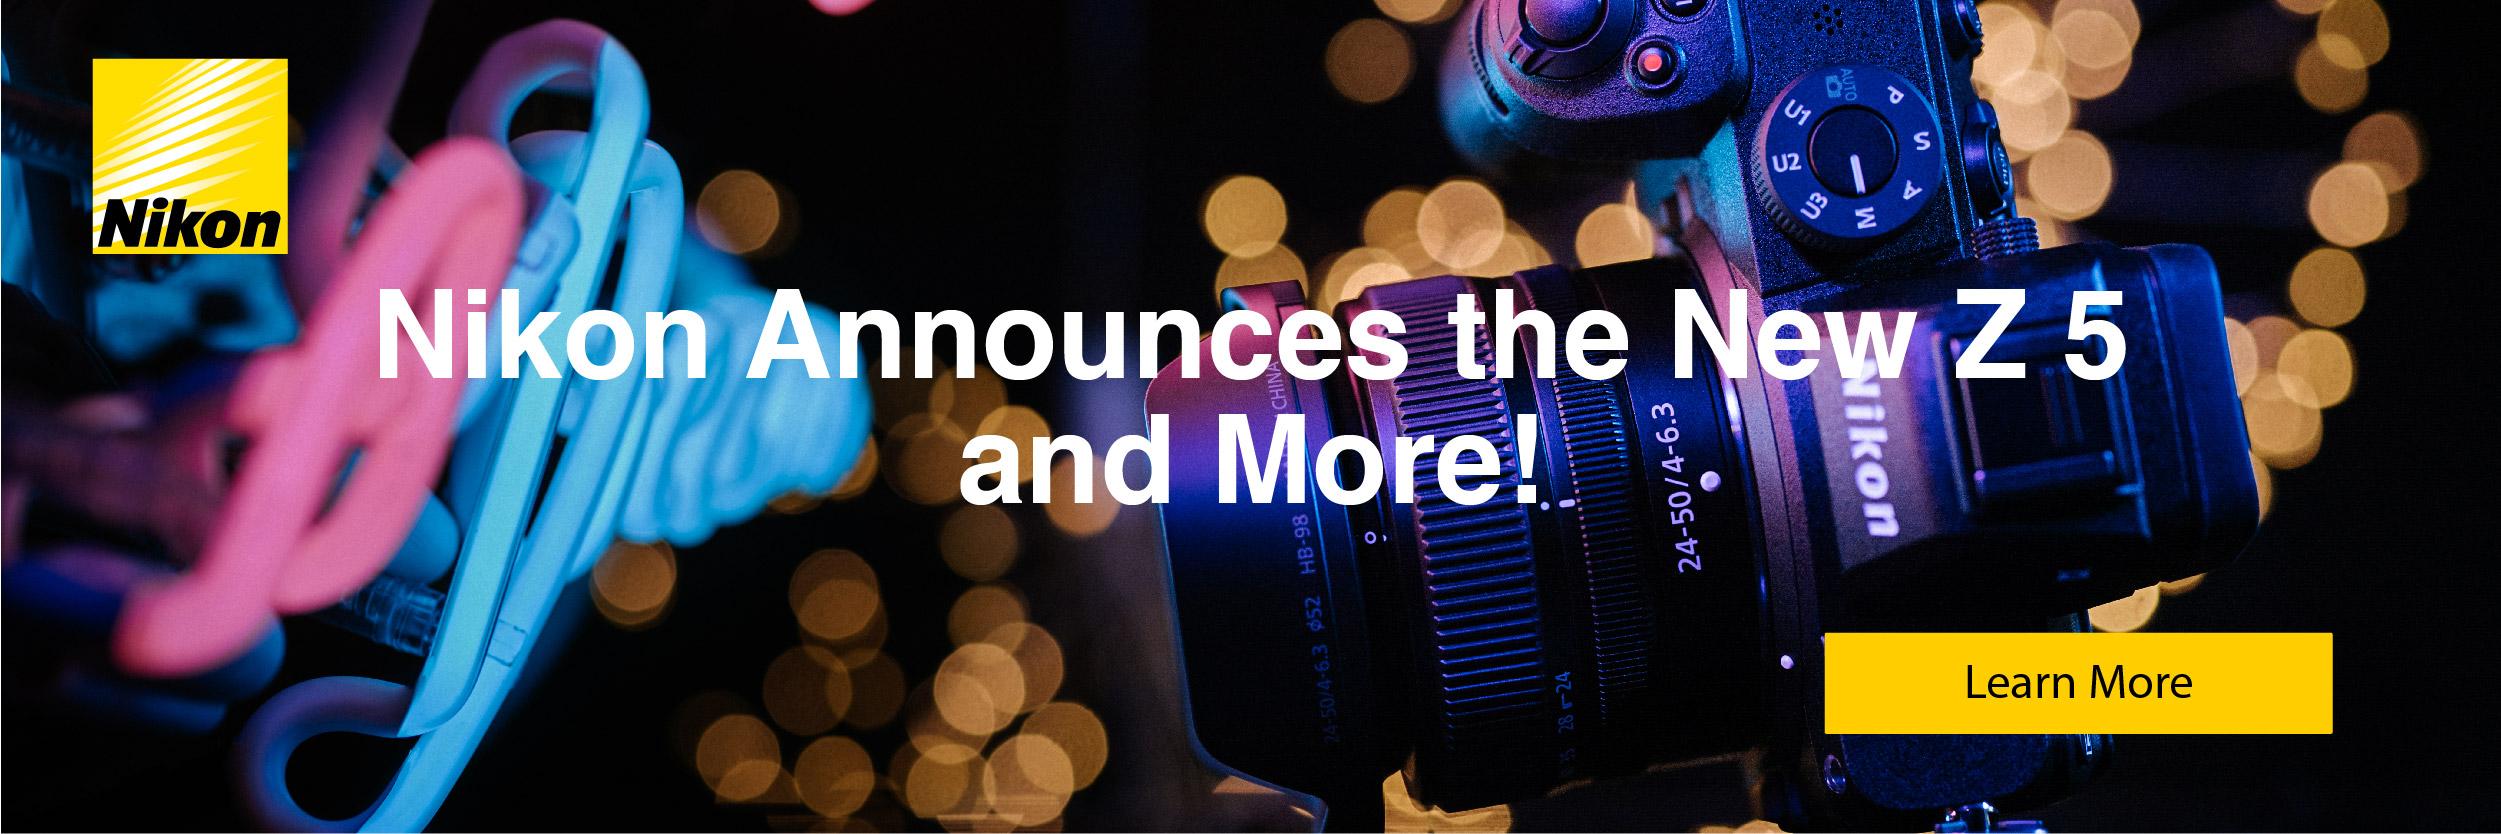 Nikon Announcements!